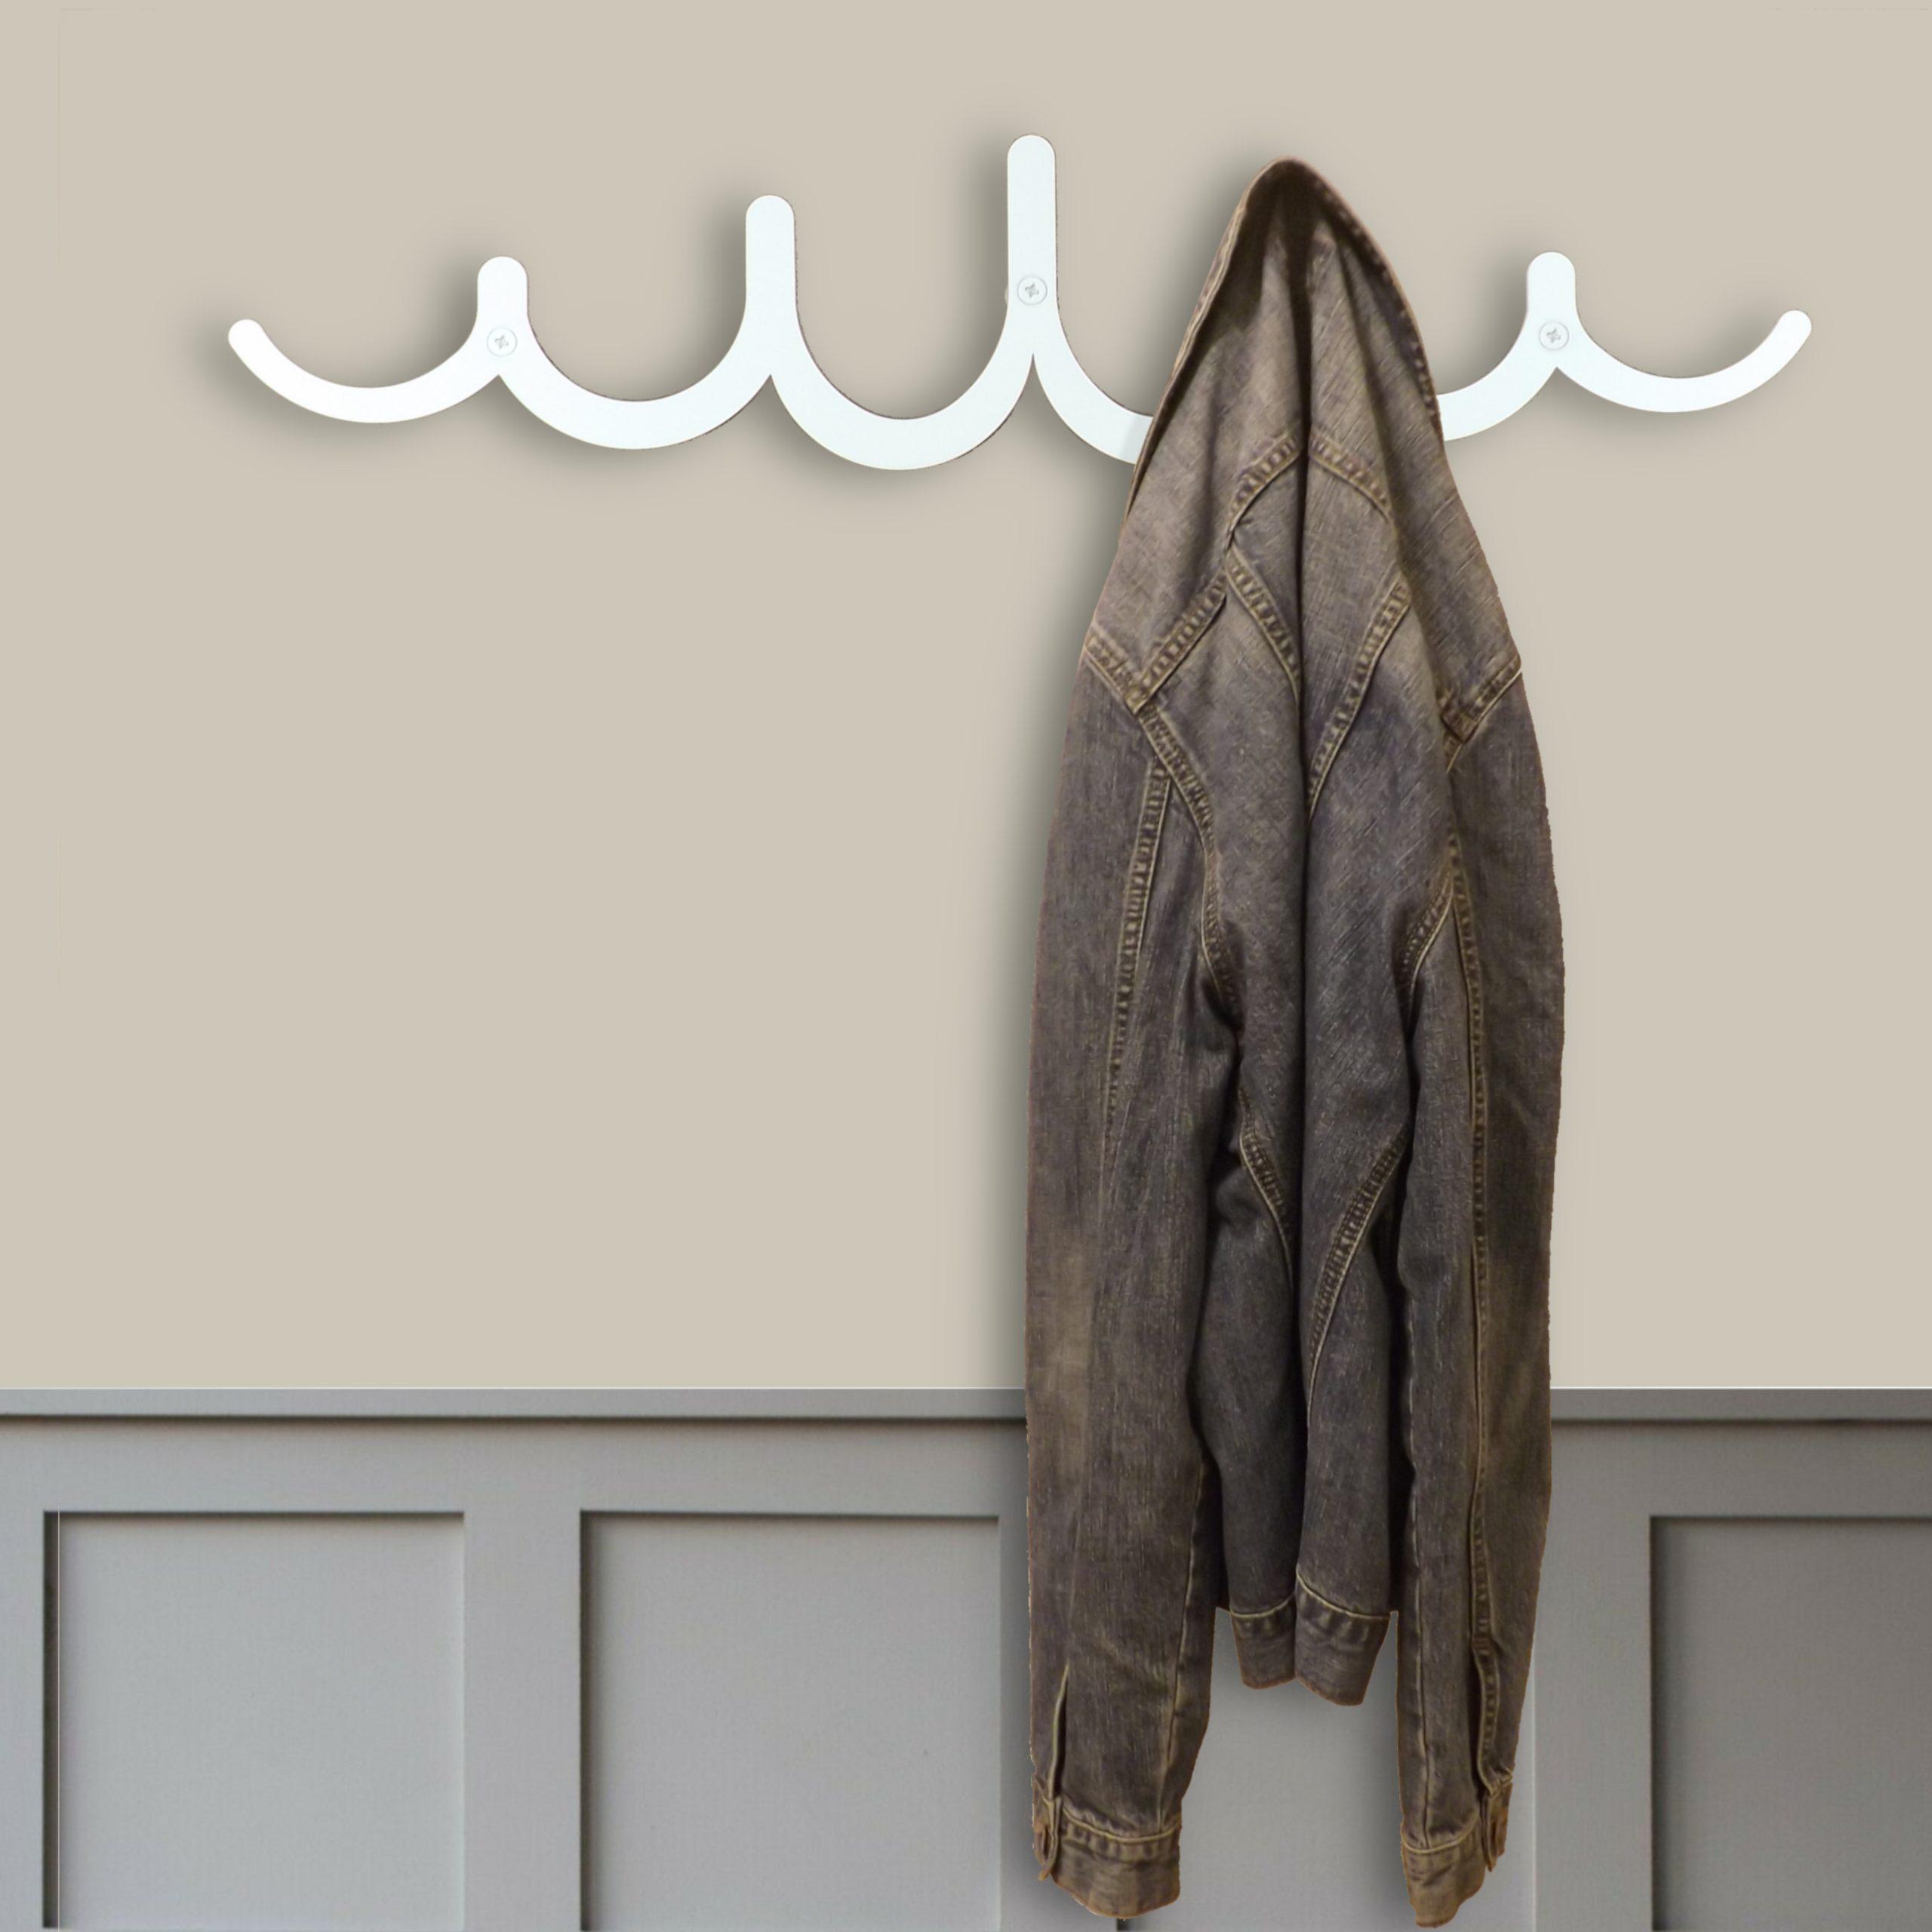 Pulse Coat Rack